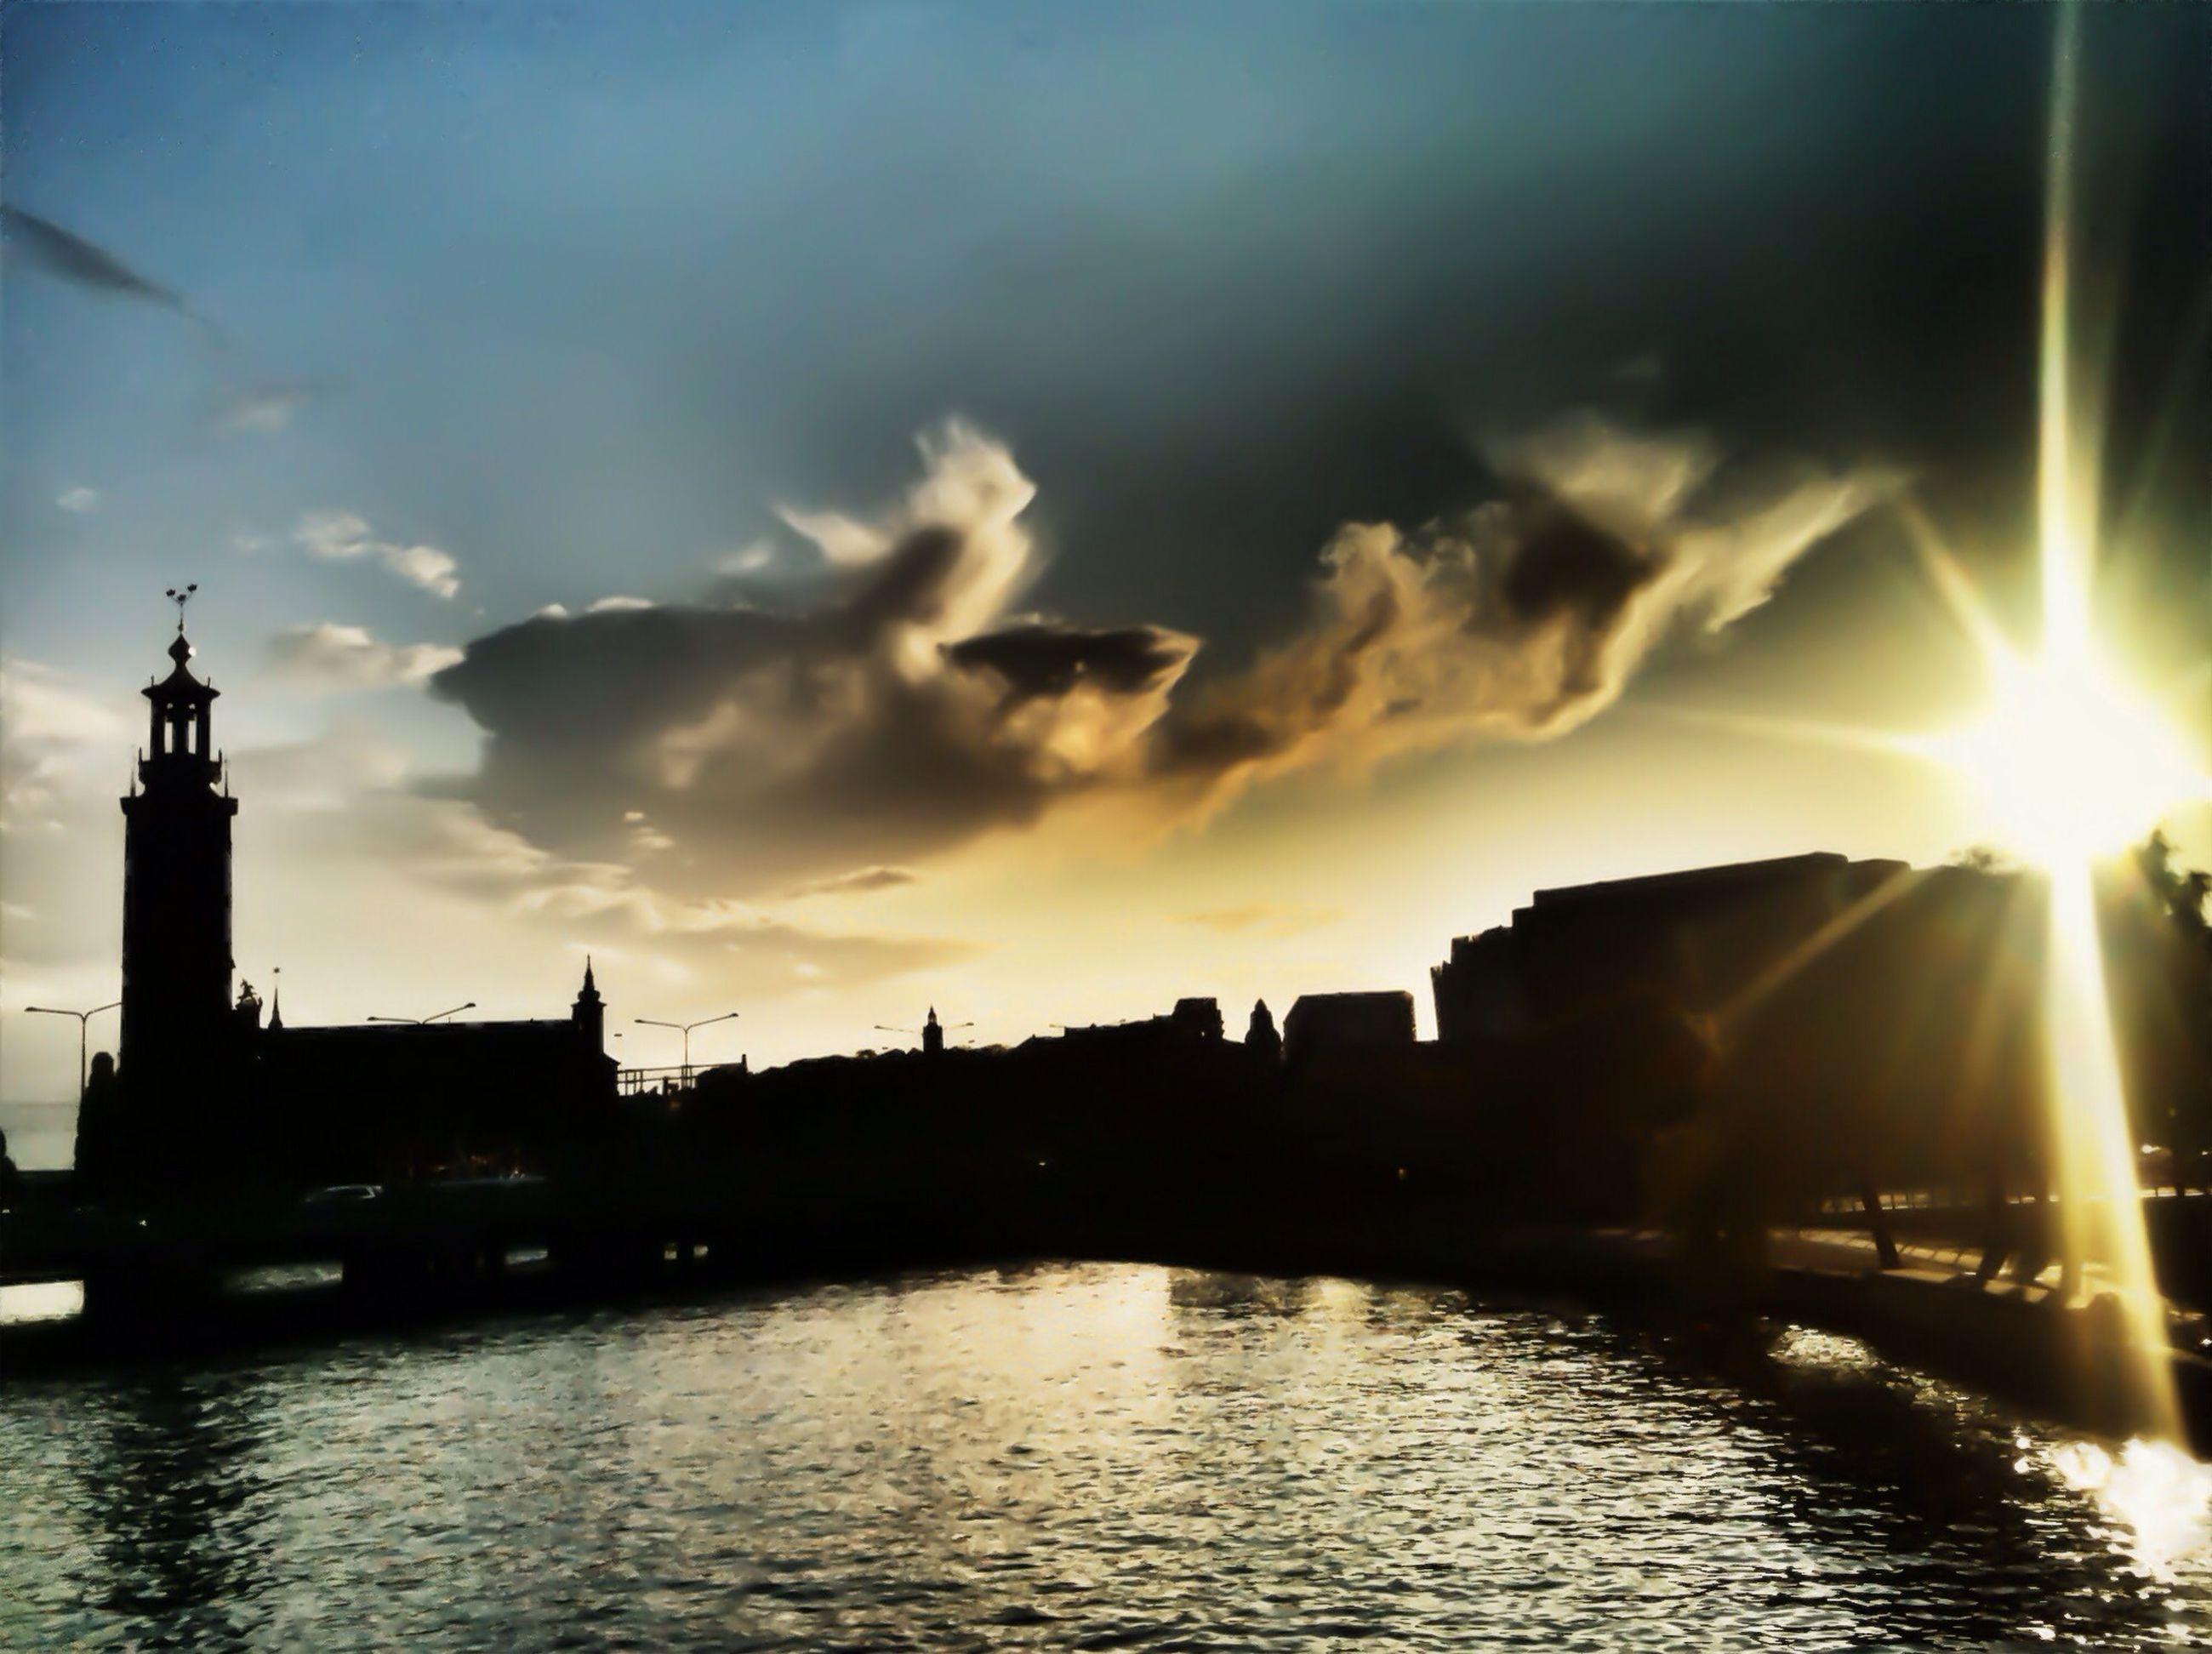 architecture, built structure, sunset, building exterior, waterfront, water, sky, sun, river, silhouette, cloud - sky, city, sunbeam, reflection, sunlight, bridge - man made structure, lens flare, cloud, connection, outdoors